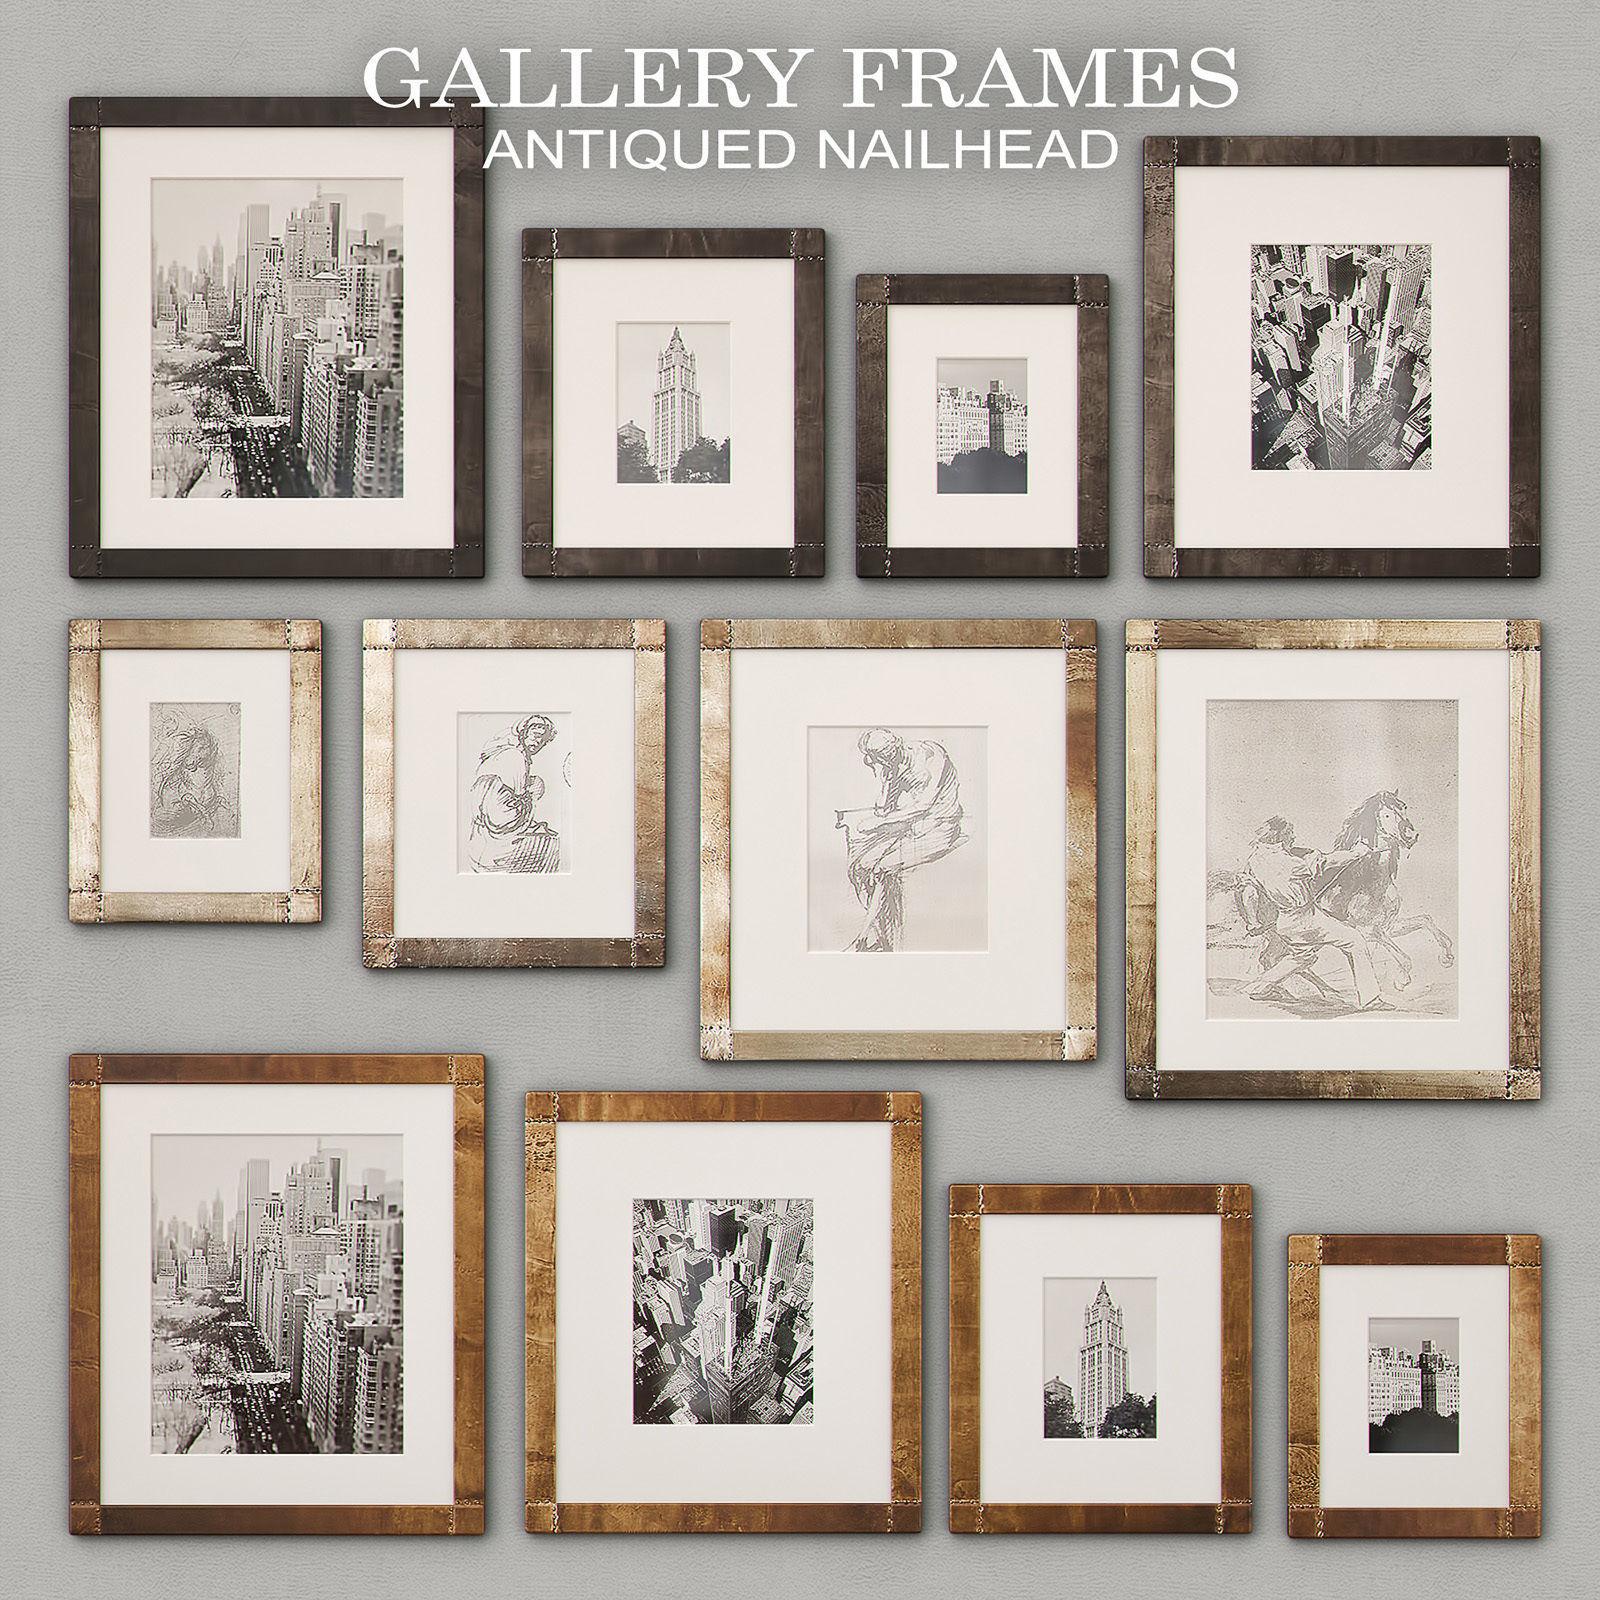 RH Antiqued Nailhead Gallery Frames